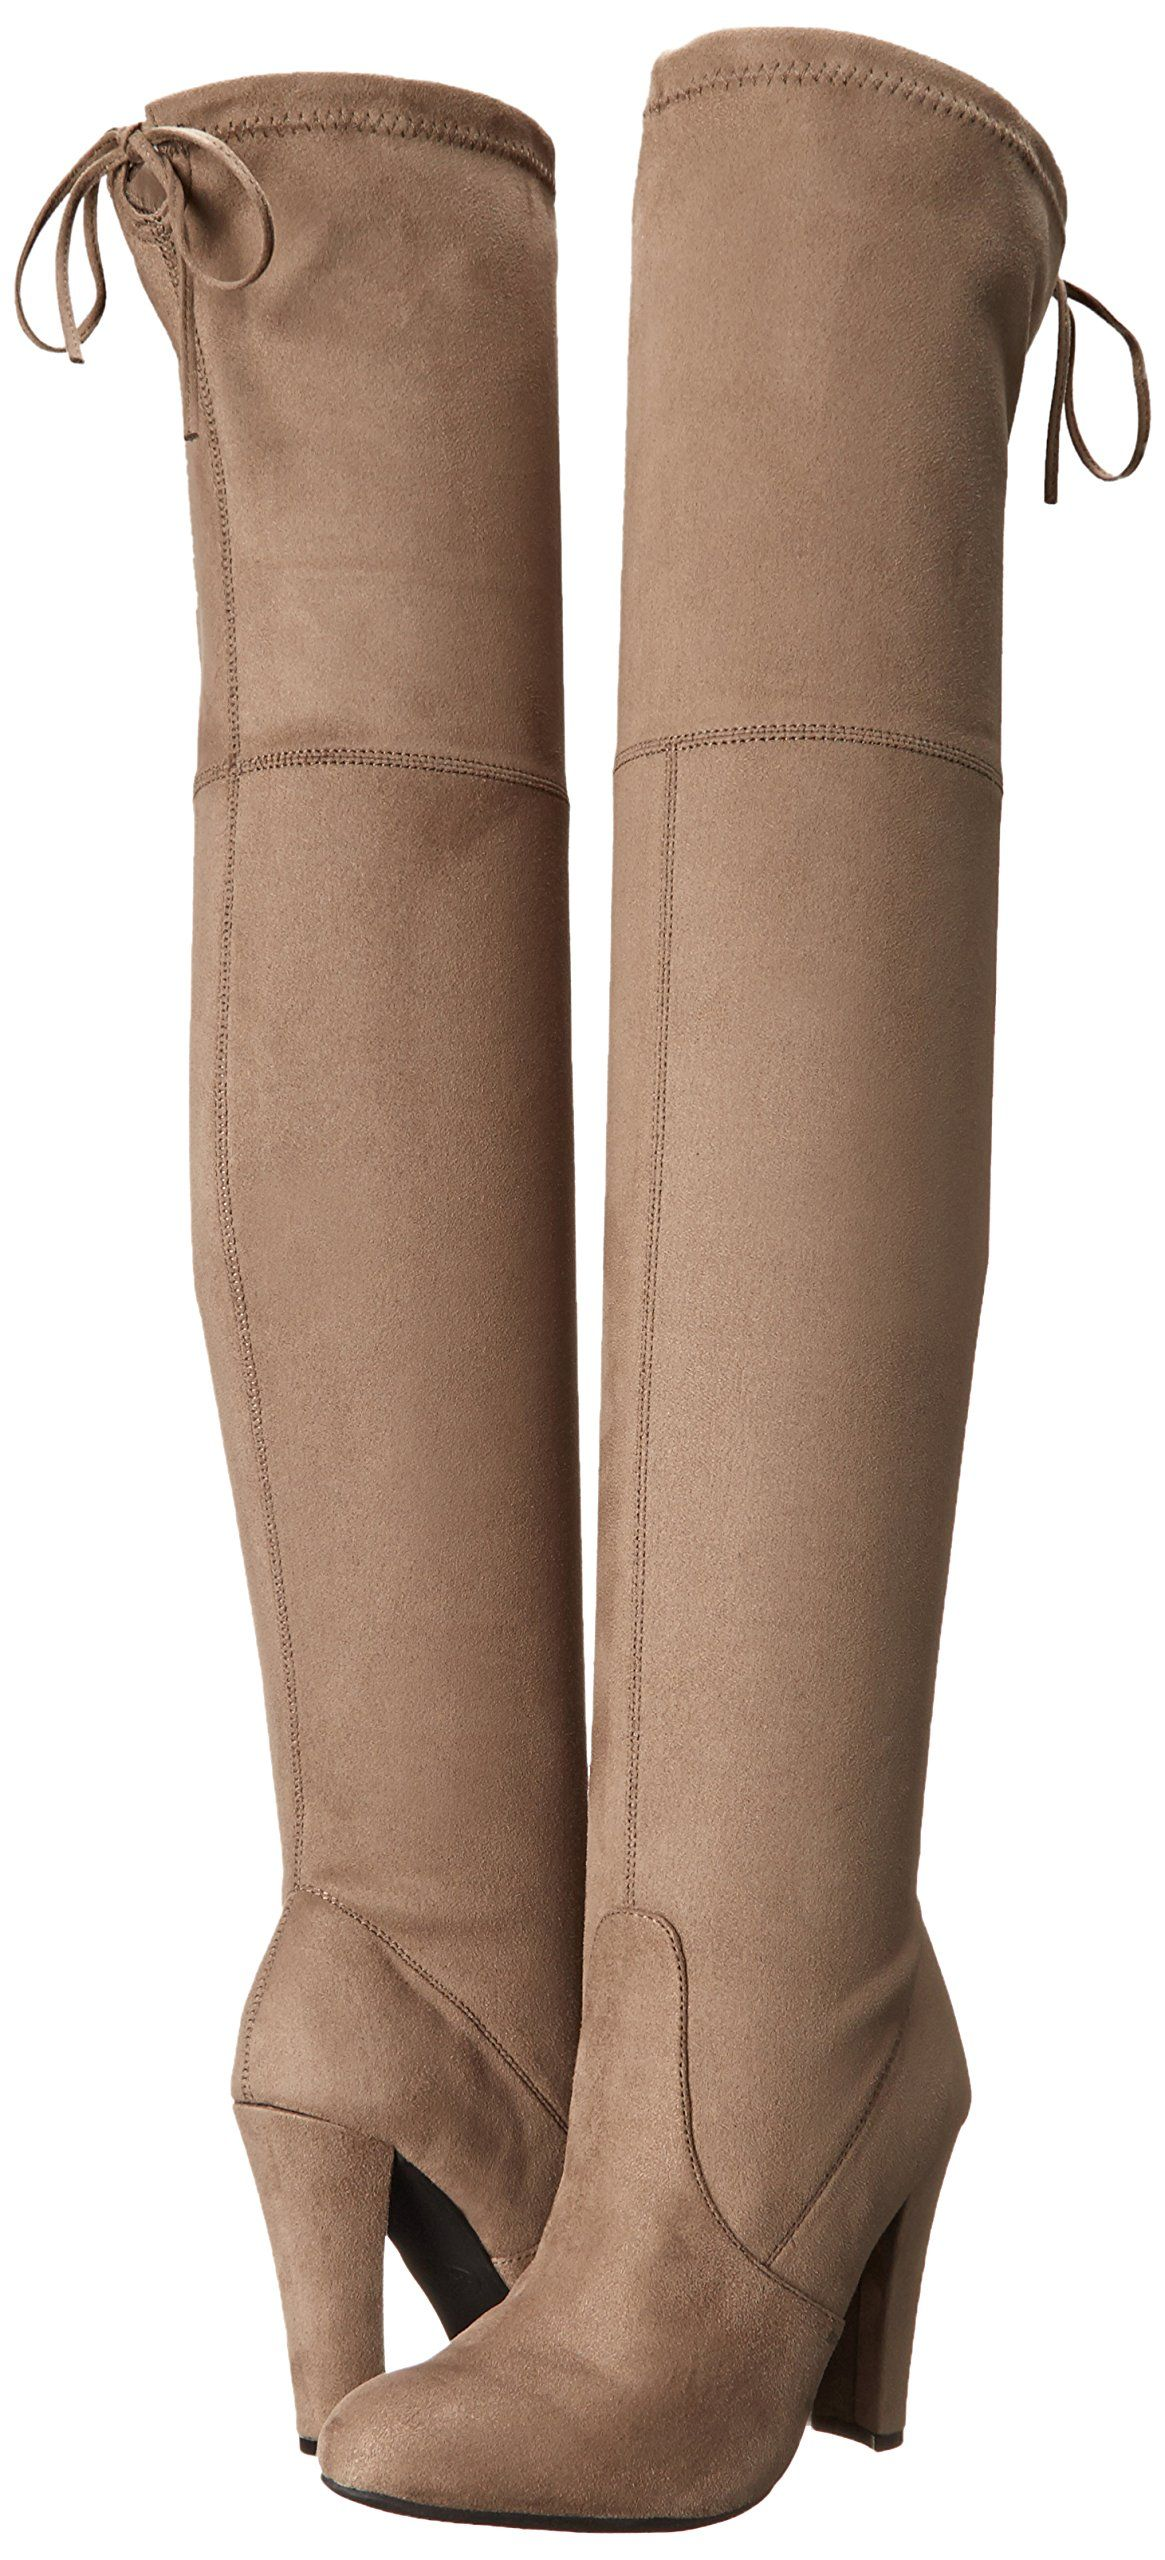 Amazon.com: Steve Madden Women's Gorgeous Winter Boot: Clothing